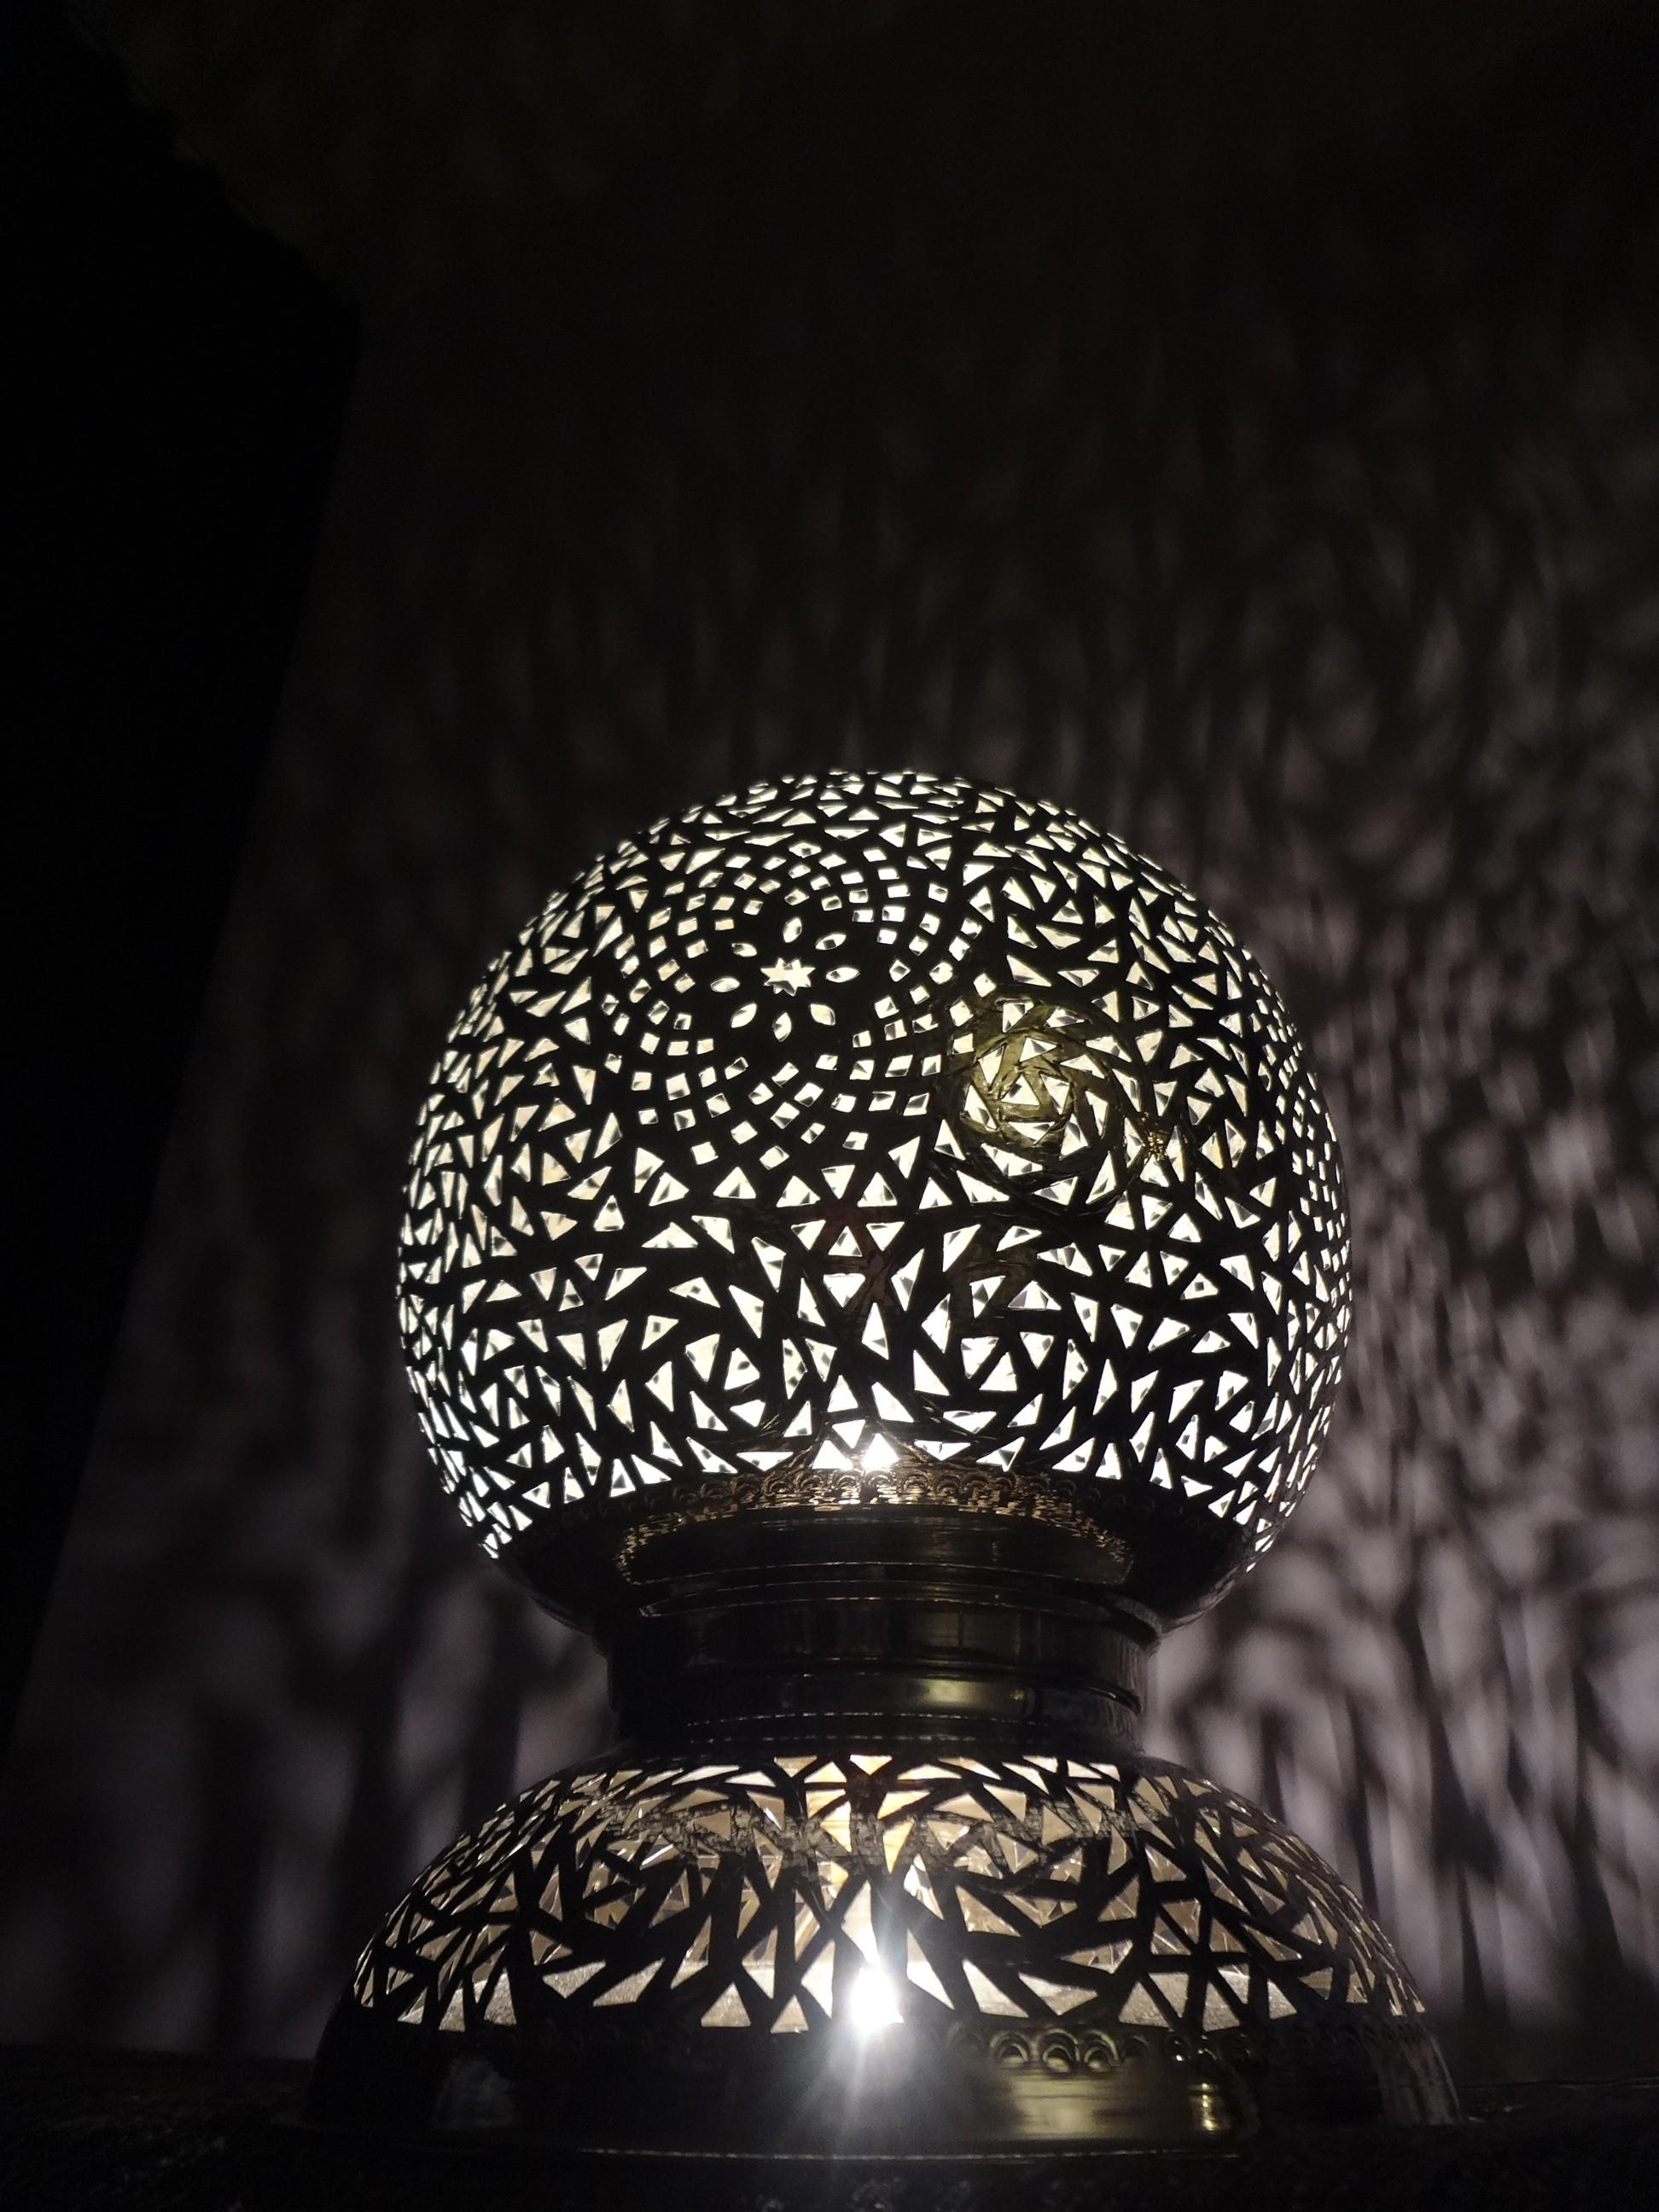 Stehlampe De Luxe, 34 cm